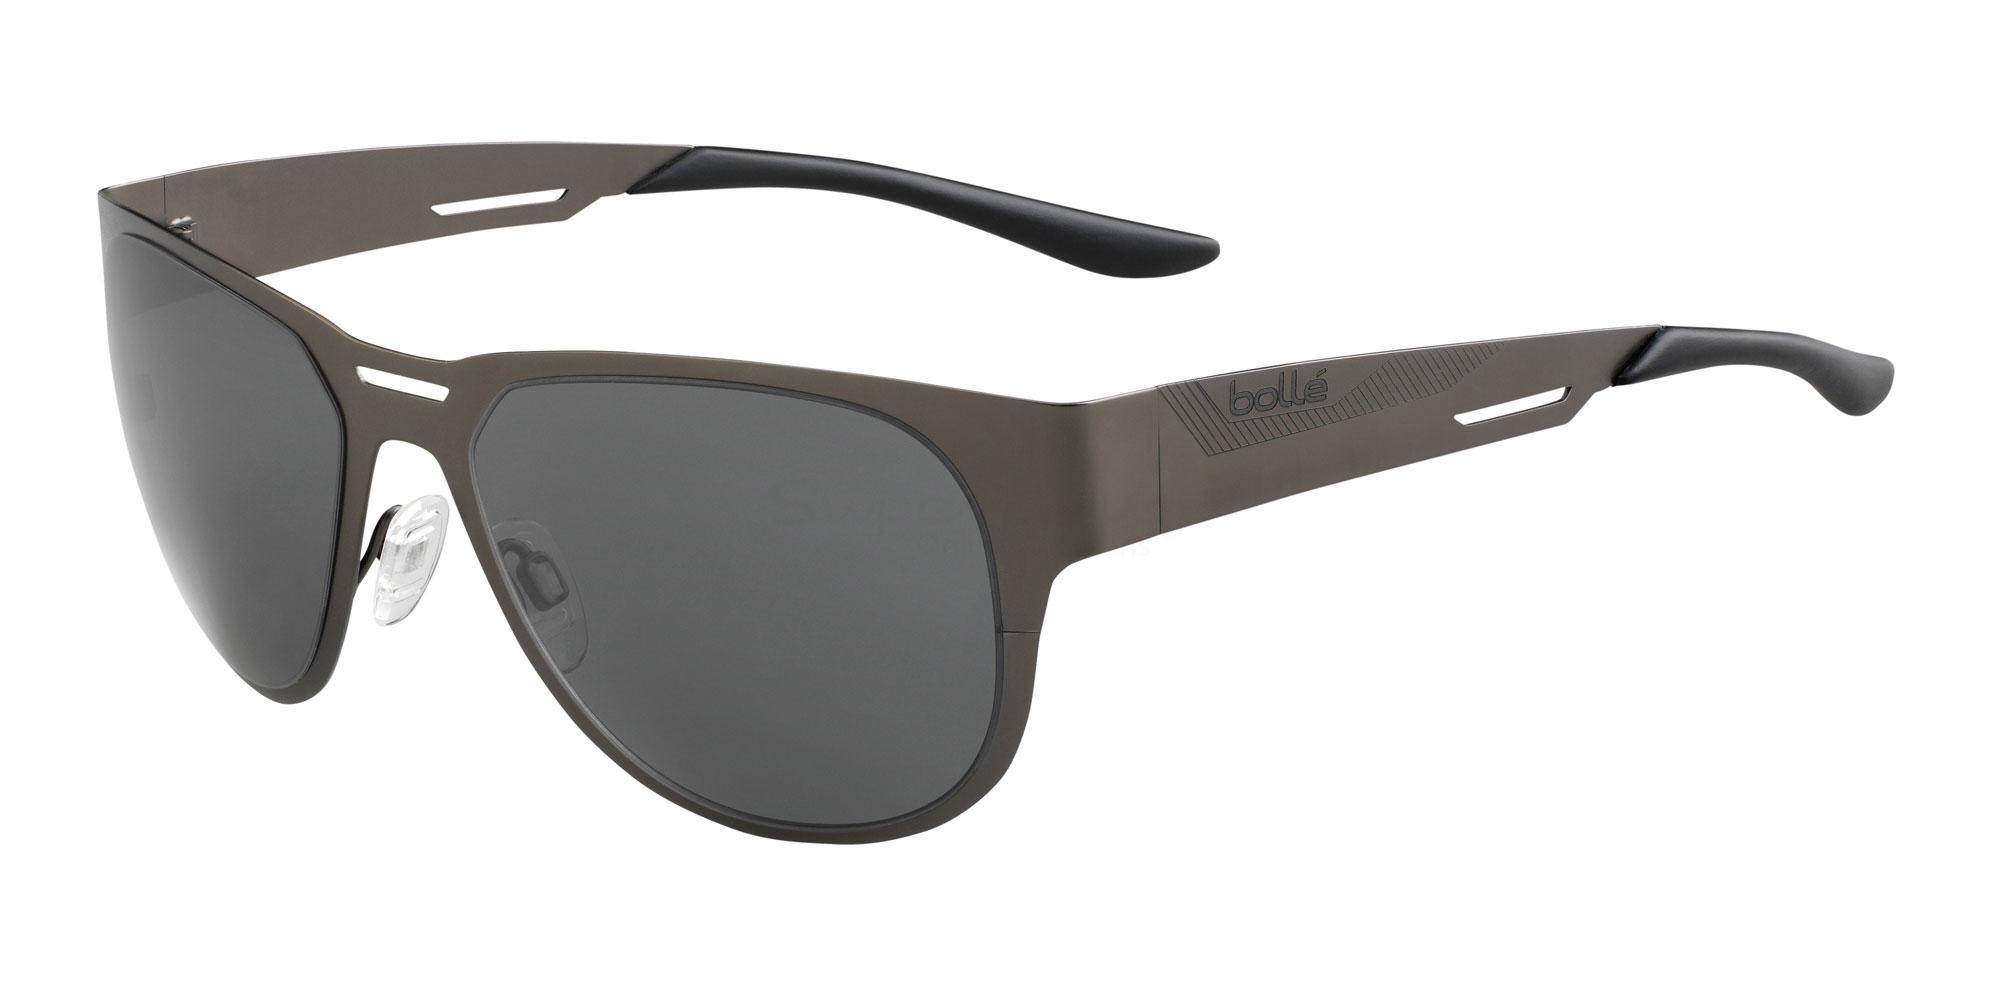 12230 Adelaide Sunglasses, Bolle